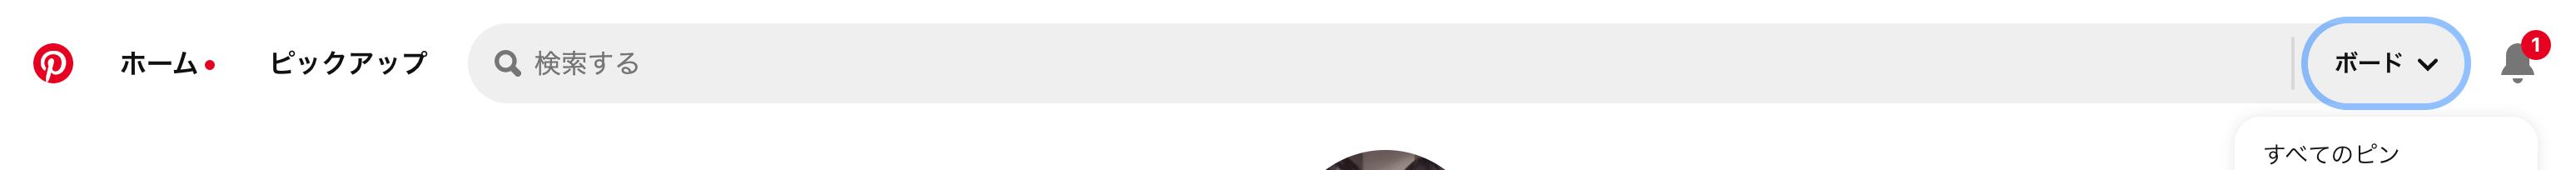 PinterestのユーザーTOP画面